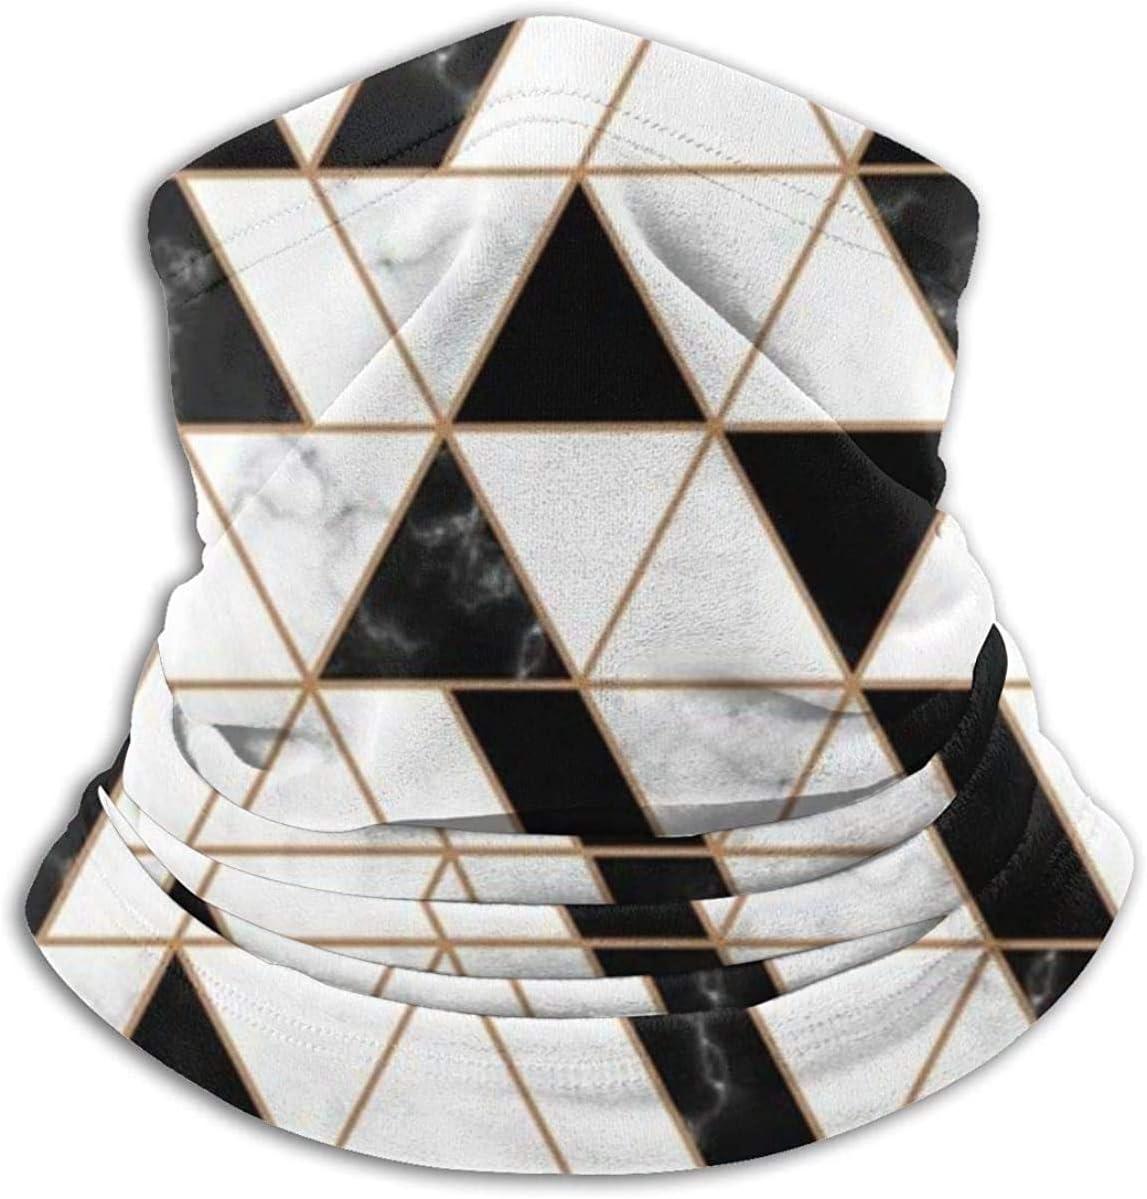 Lastbest Marble White Black Neck Warmer Multifunction Scarf Hat Neck Gaiter Neck Cap Bala Windproof Neck Heating Wrap Outdoor Sports